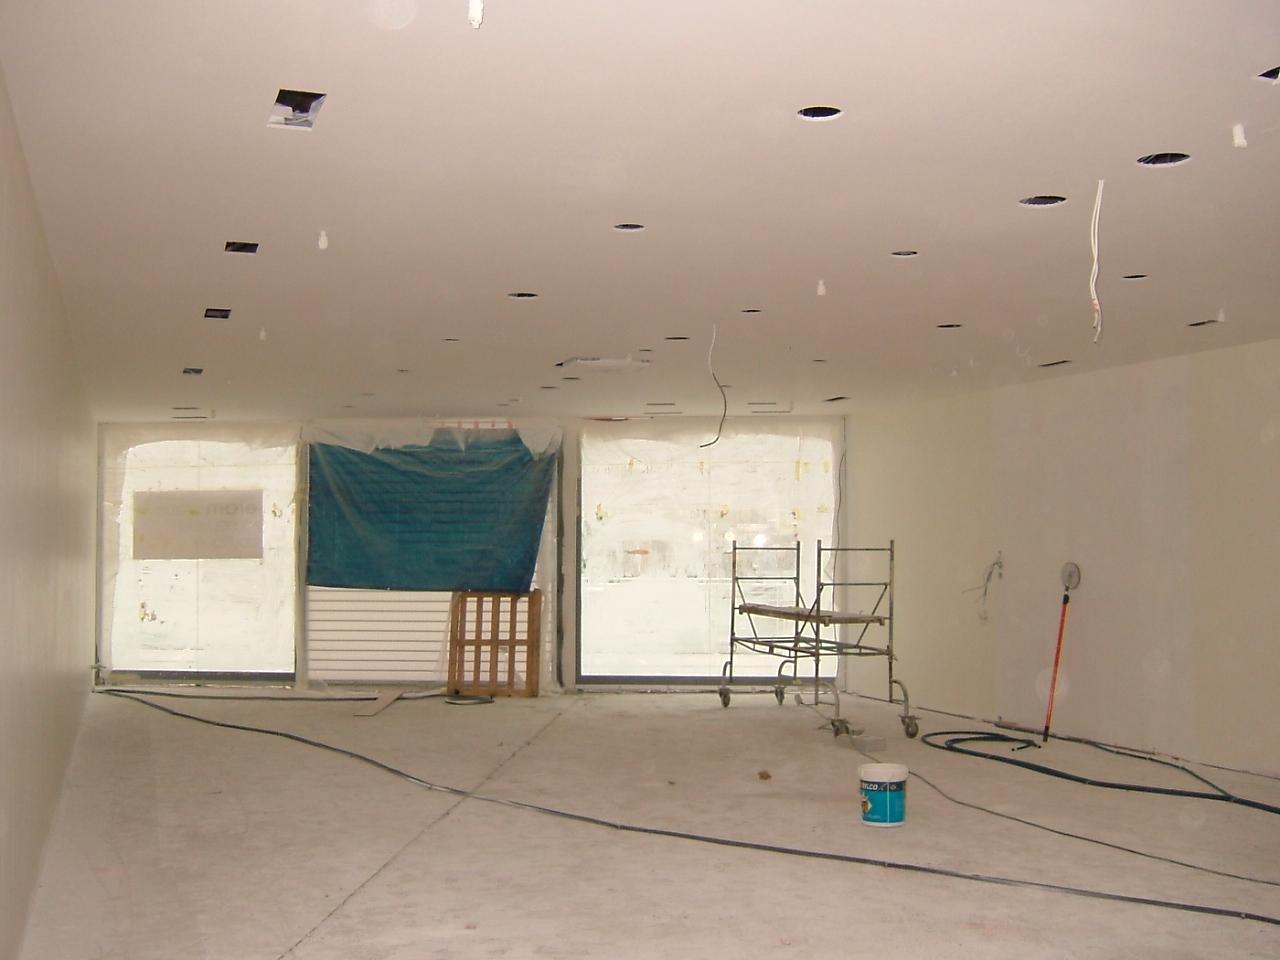 Eram cap vert bruz peinture plafond mur couche 1 et for Raccord peinture mur plafond